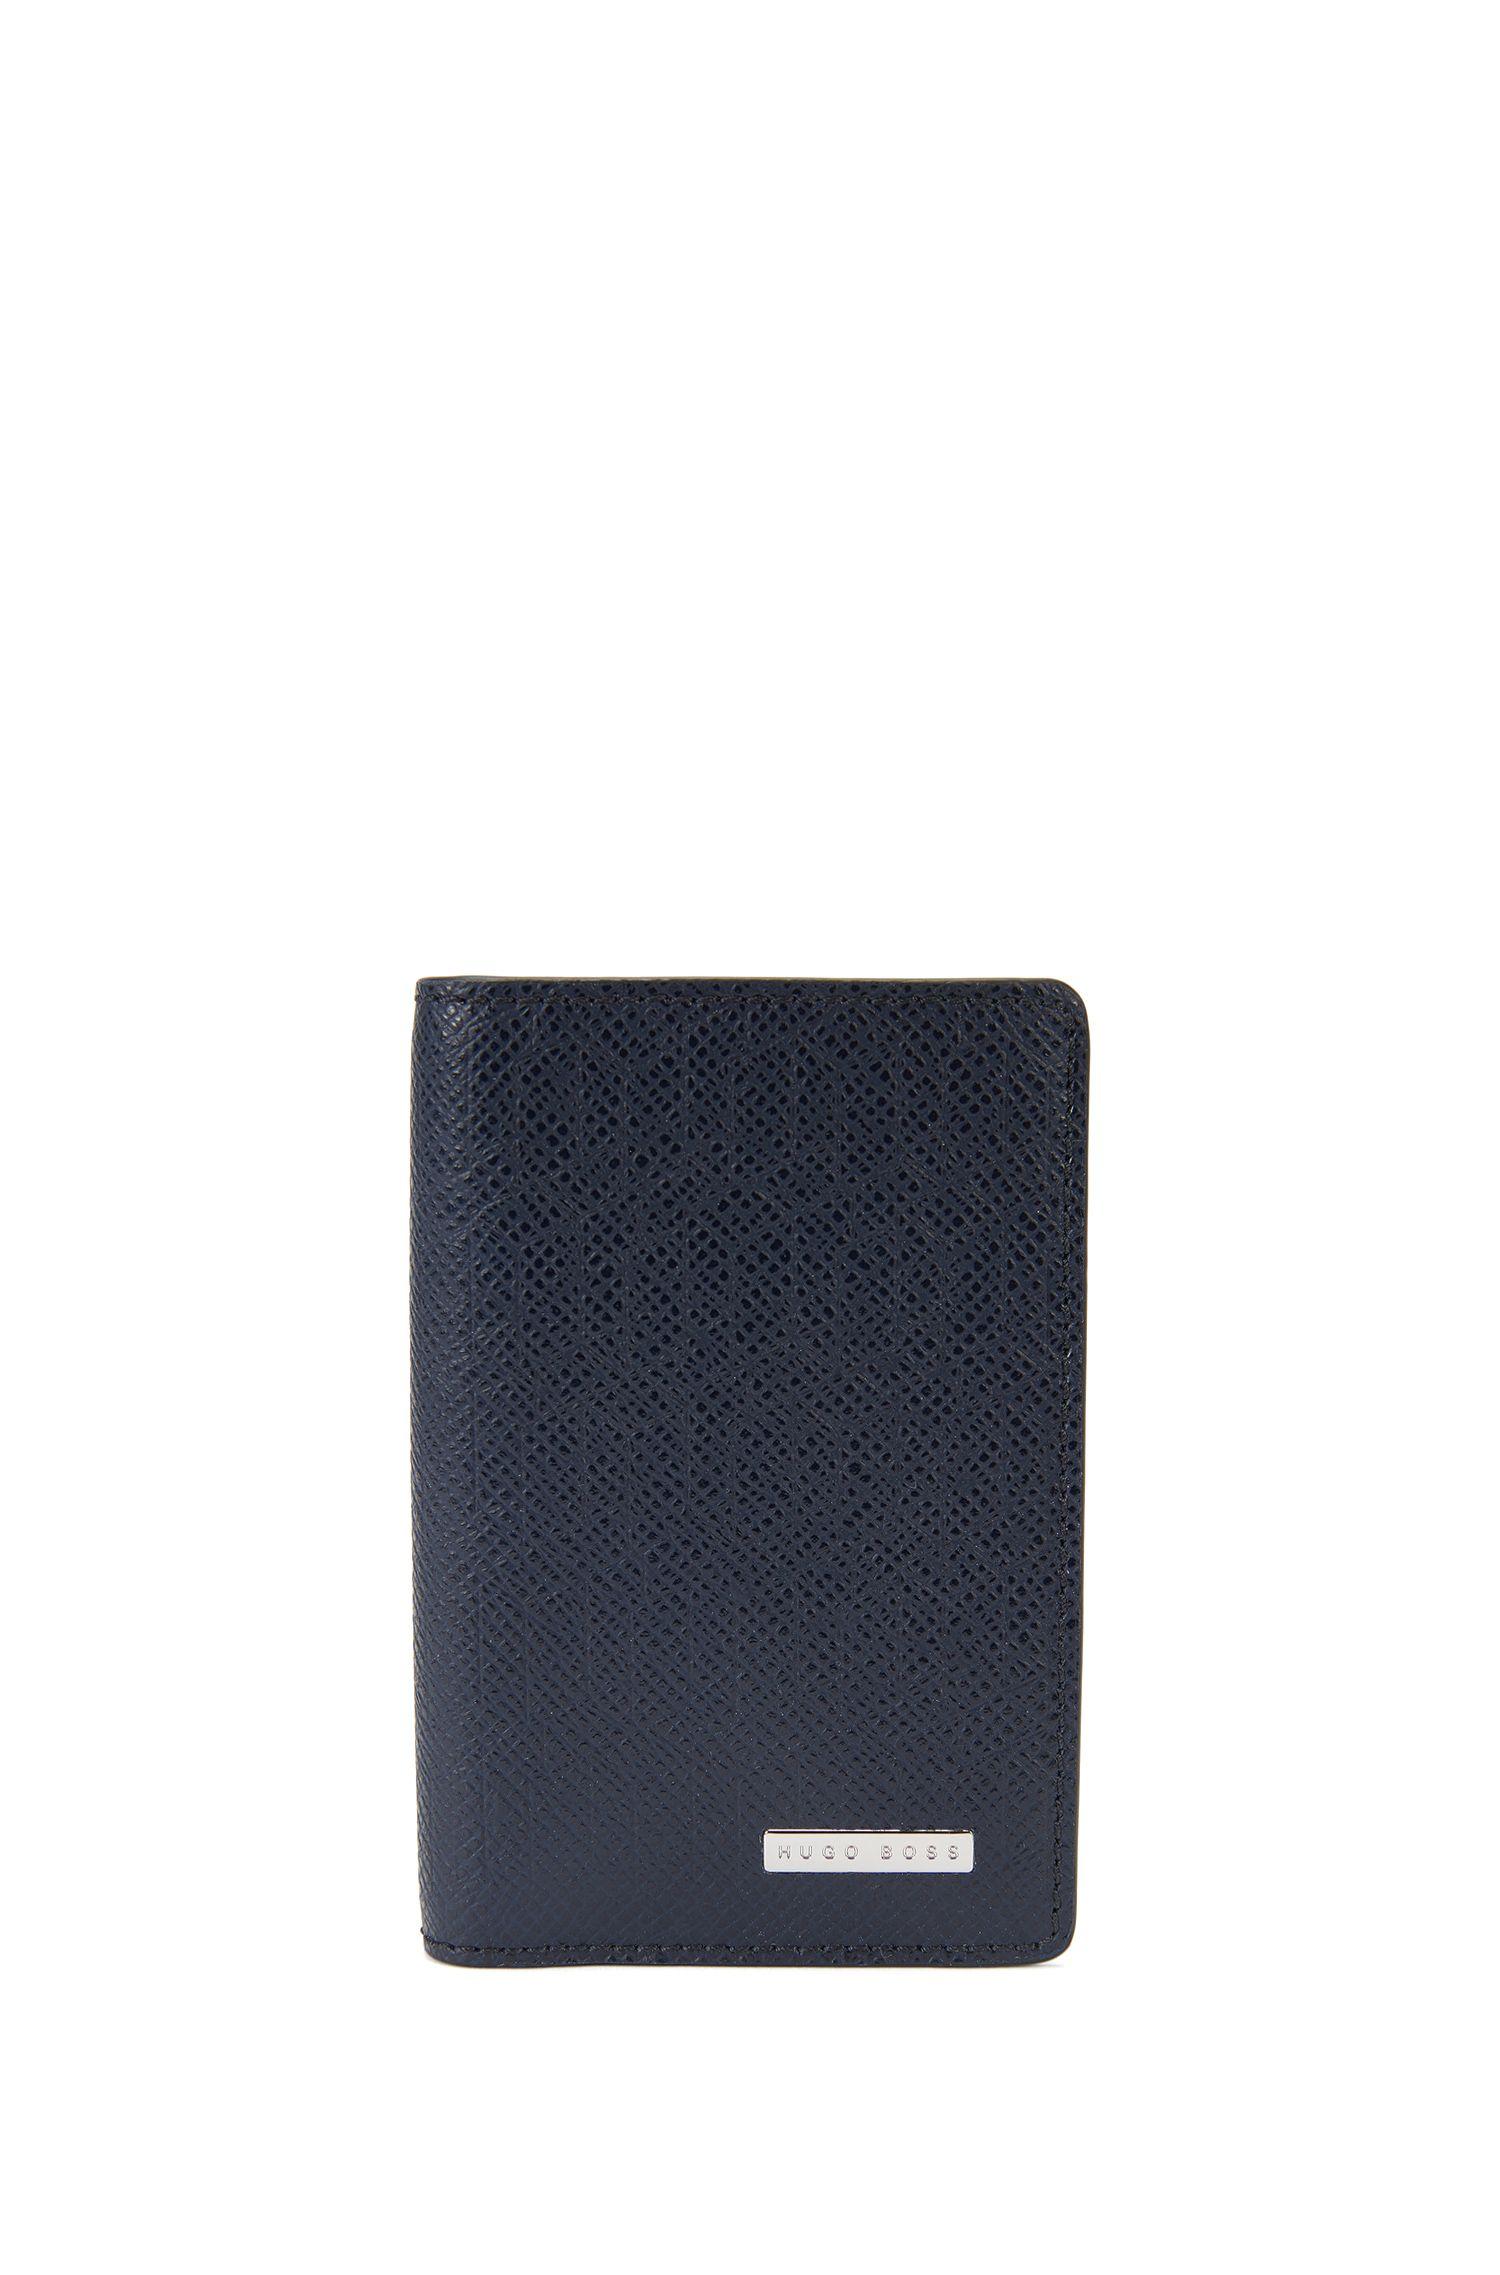 Hoge, openklapbare portemonnee van palmellatoleer uit de Signature Holiday Edition